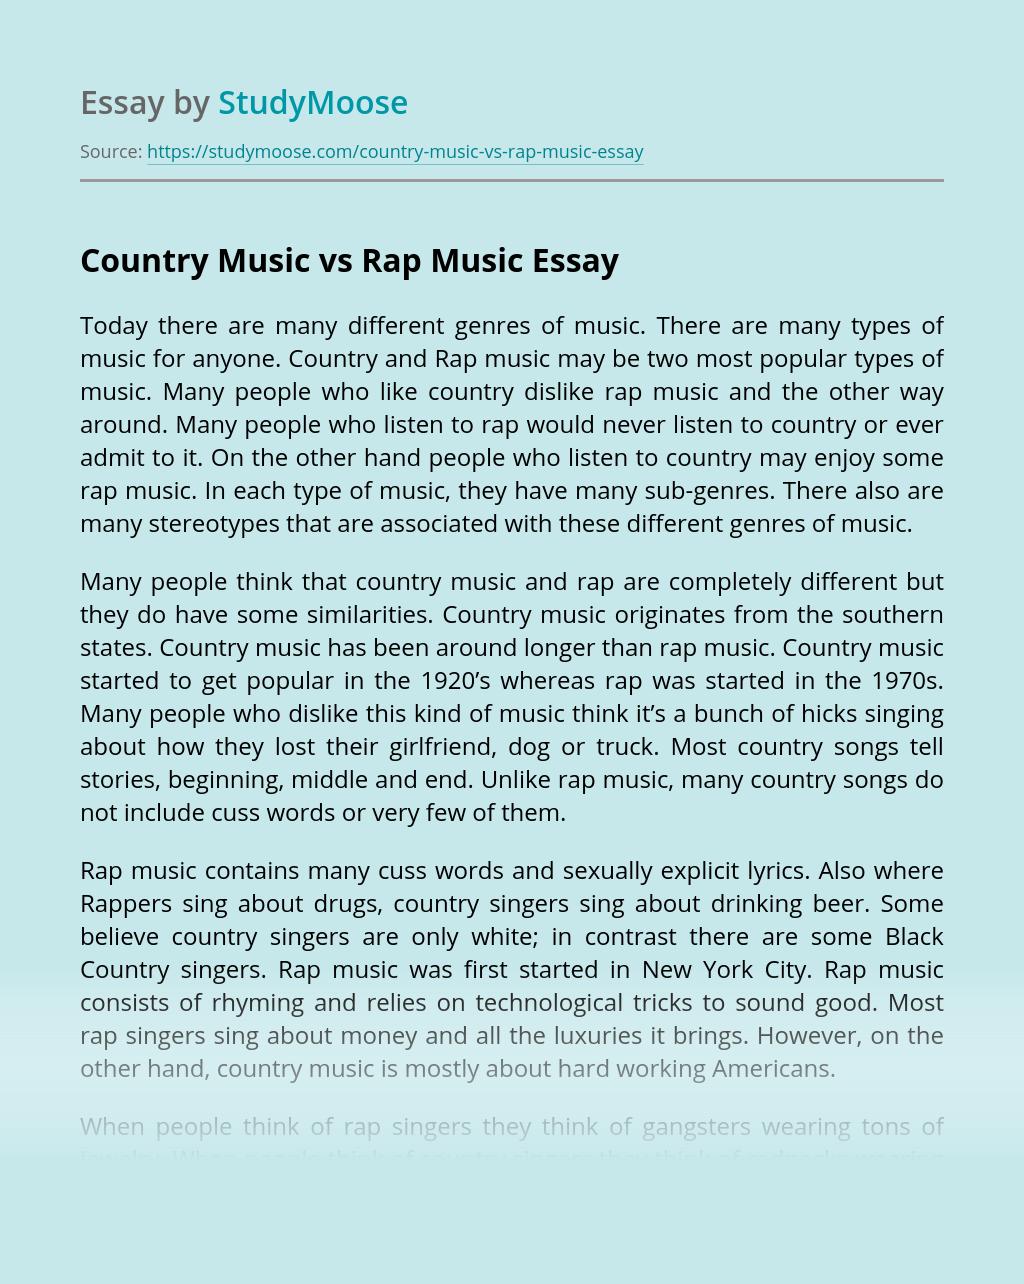 Country Music vs Rap Music